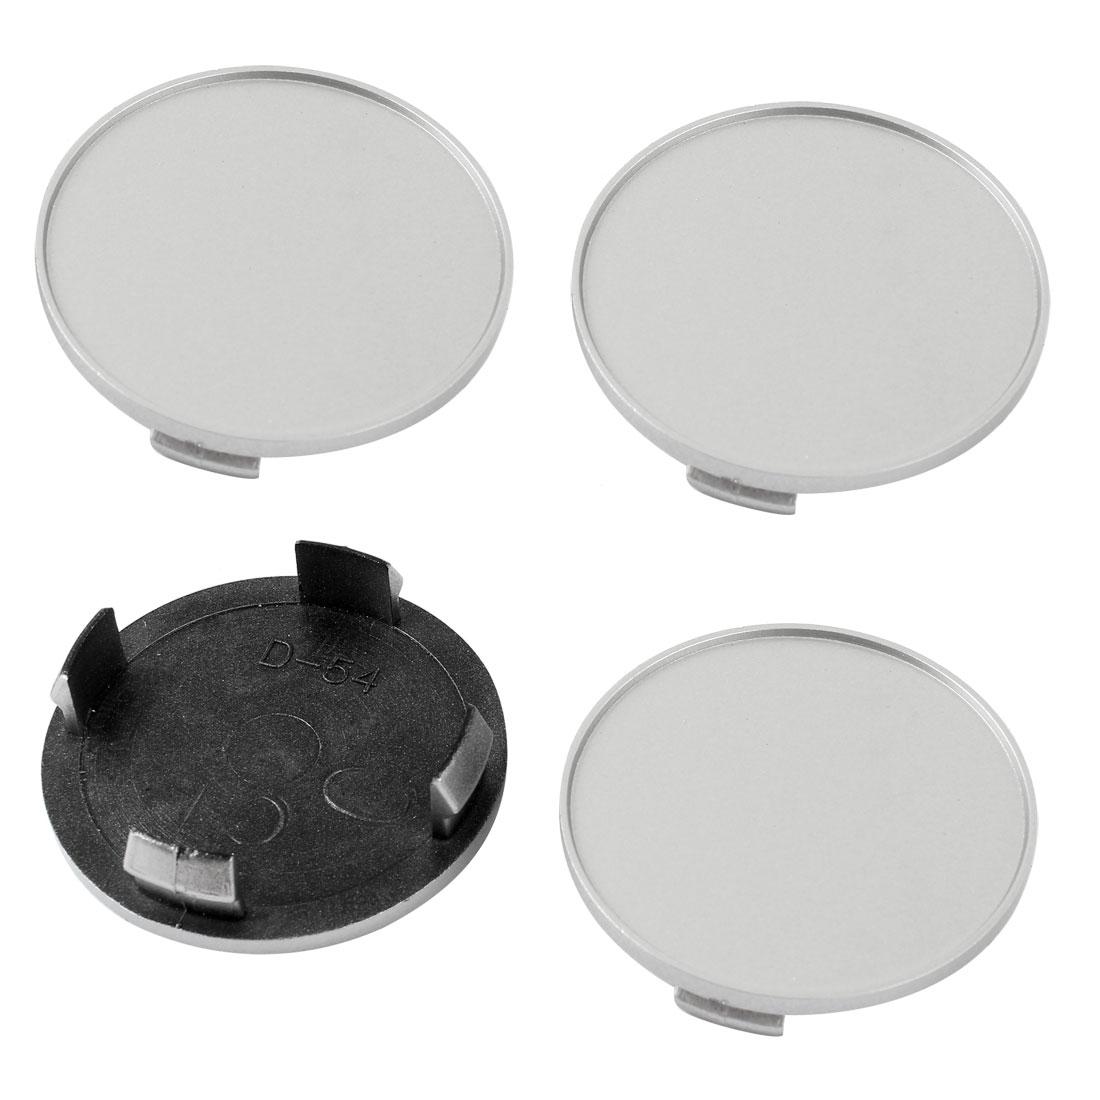 4 Pcs Gray Plastic 4 Lug Wheel Covers Caps 60mm Dia for Auto Car